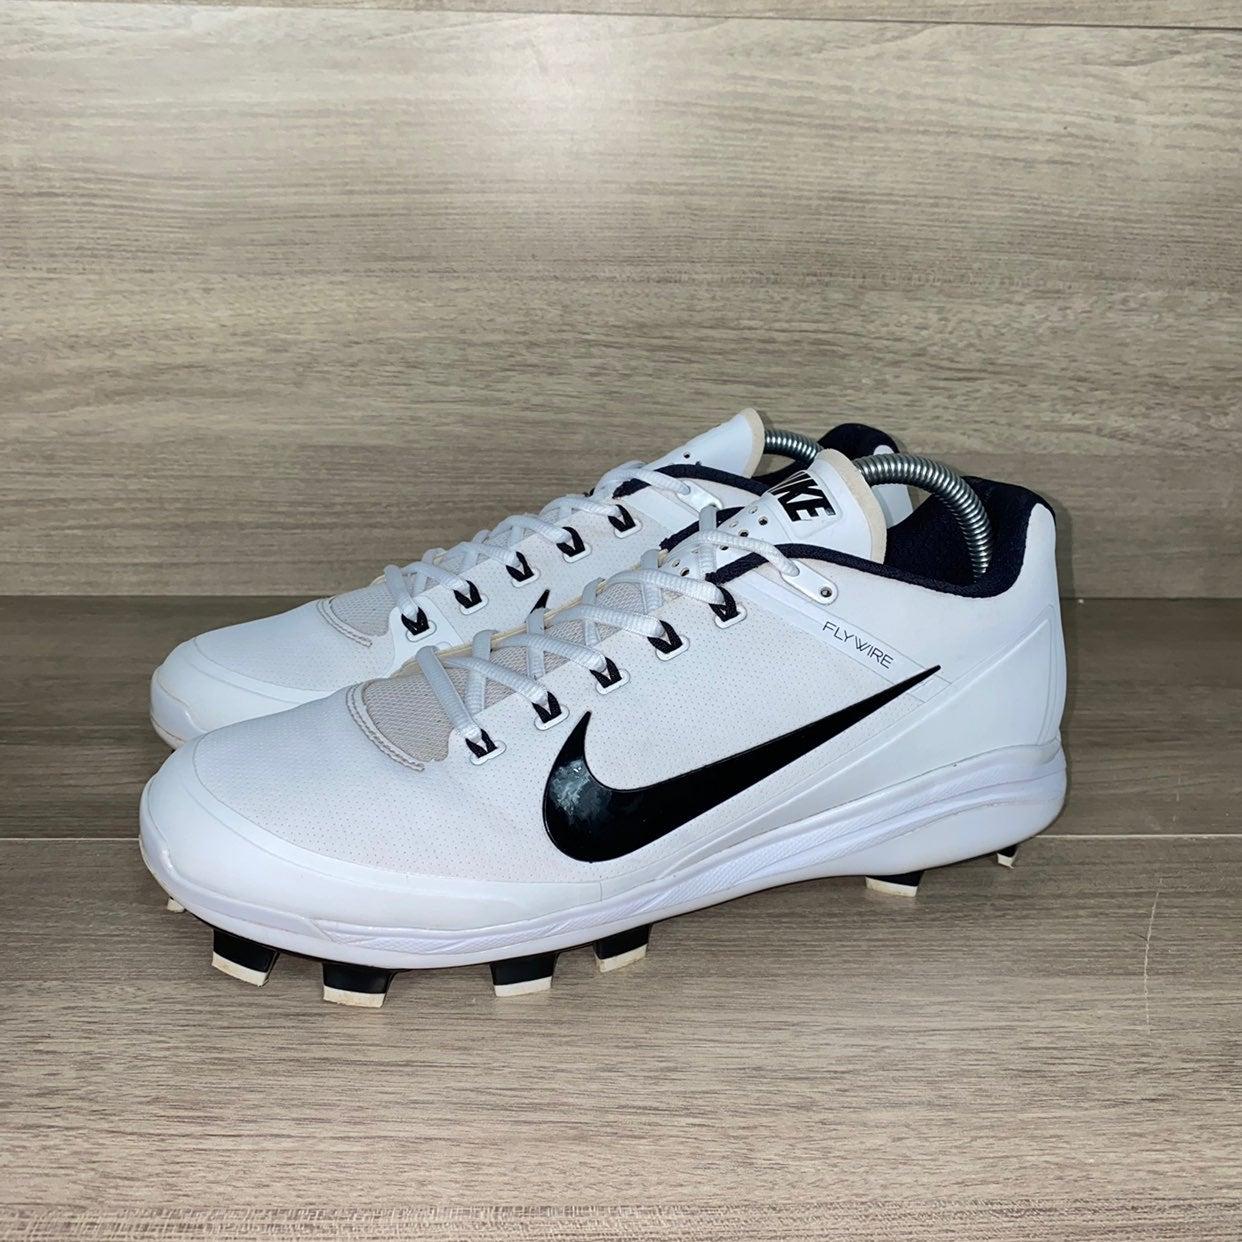 Nike Clipper '17 MCS Baseball Cleats